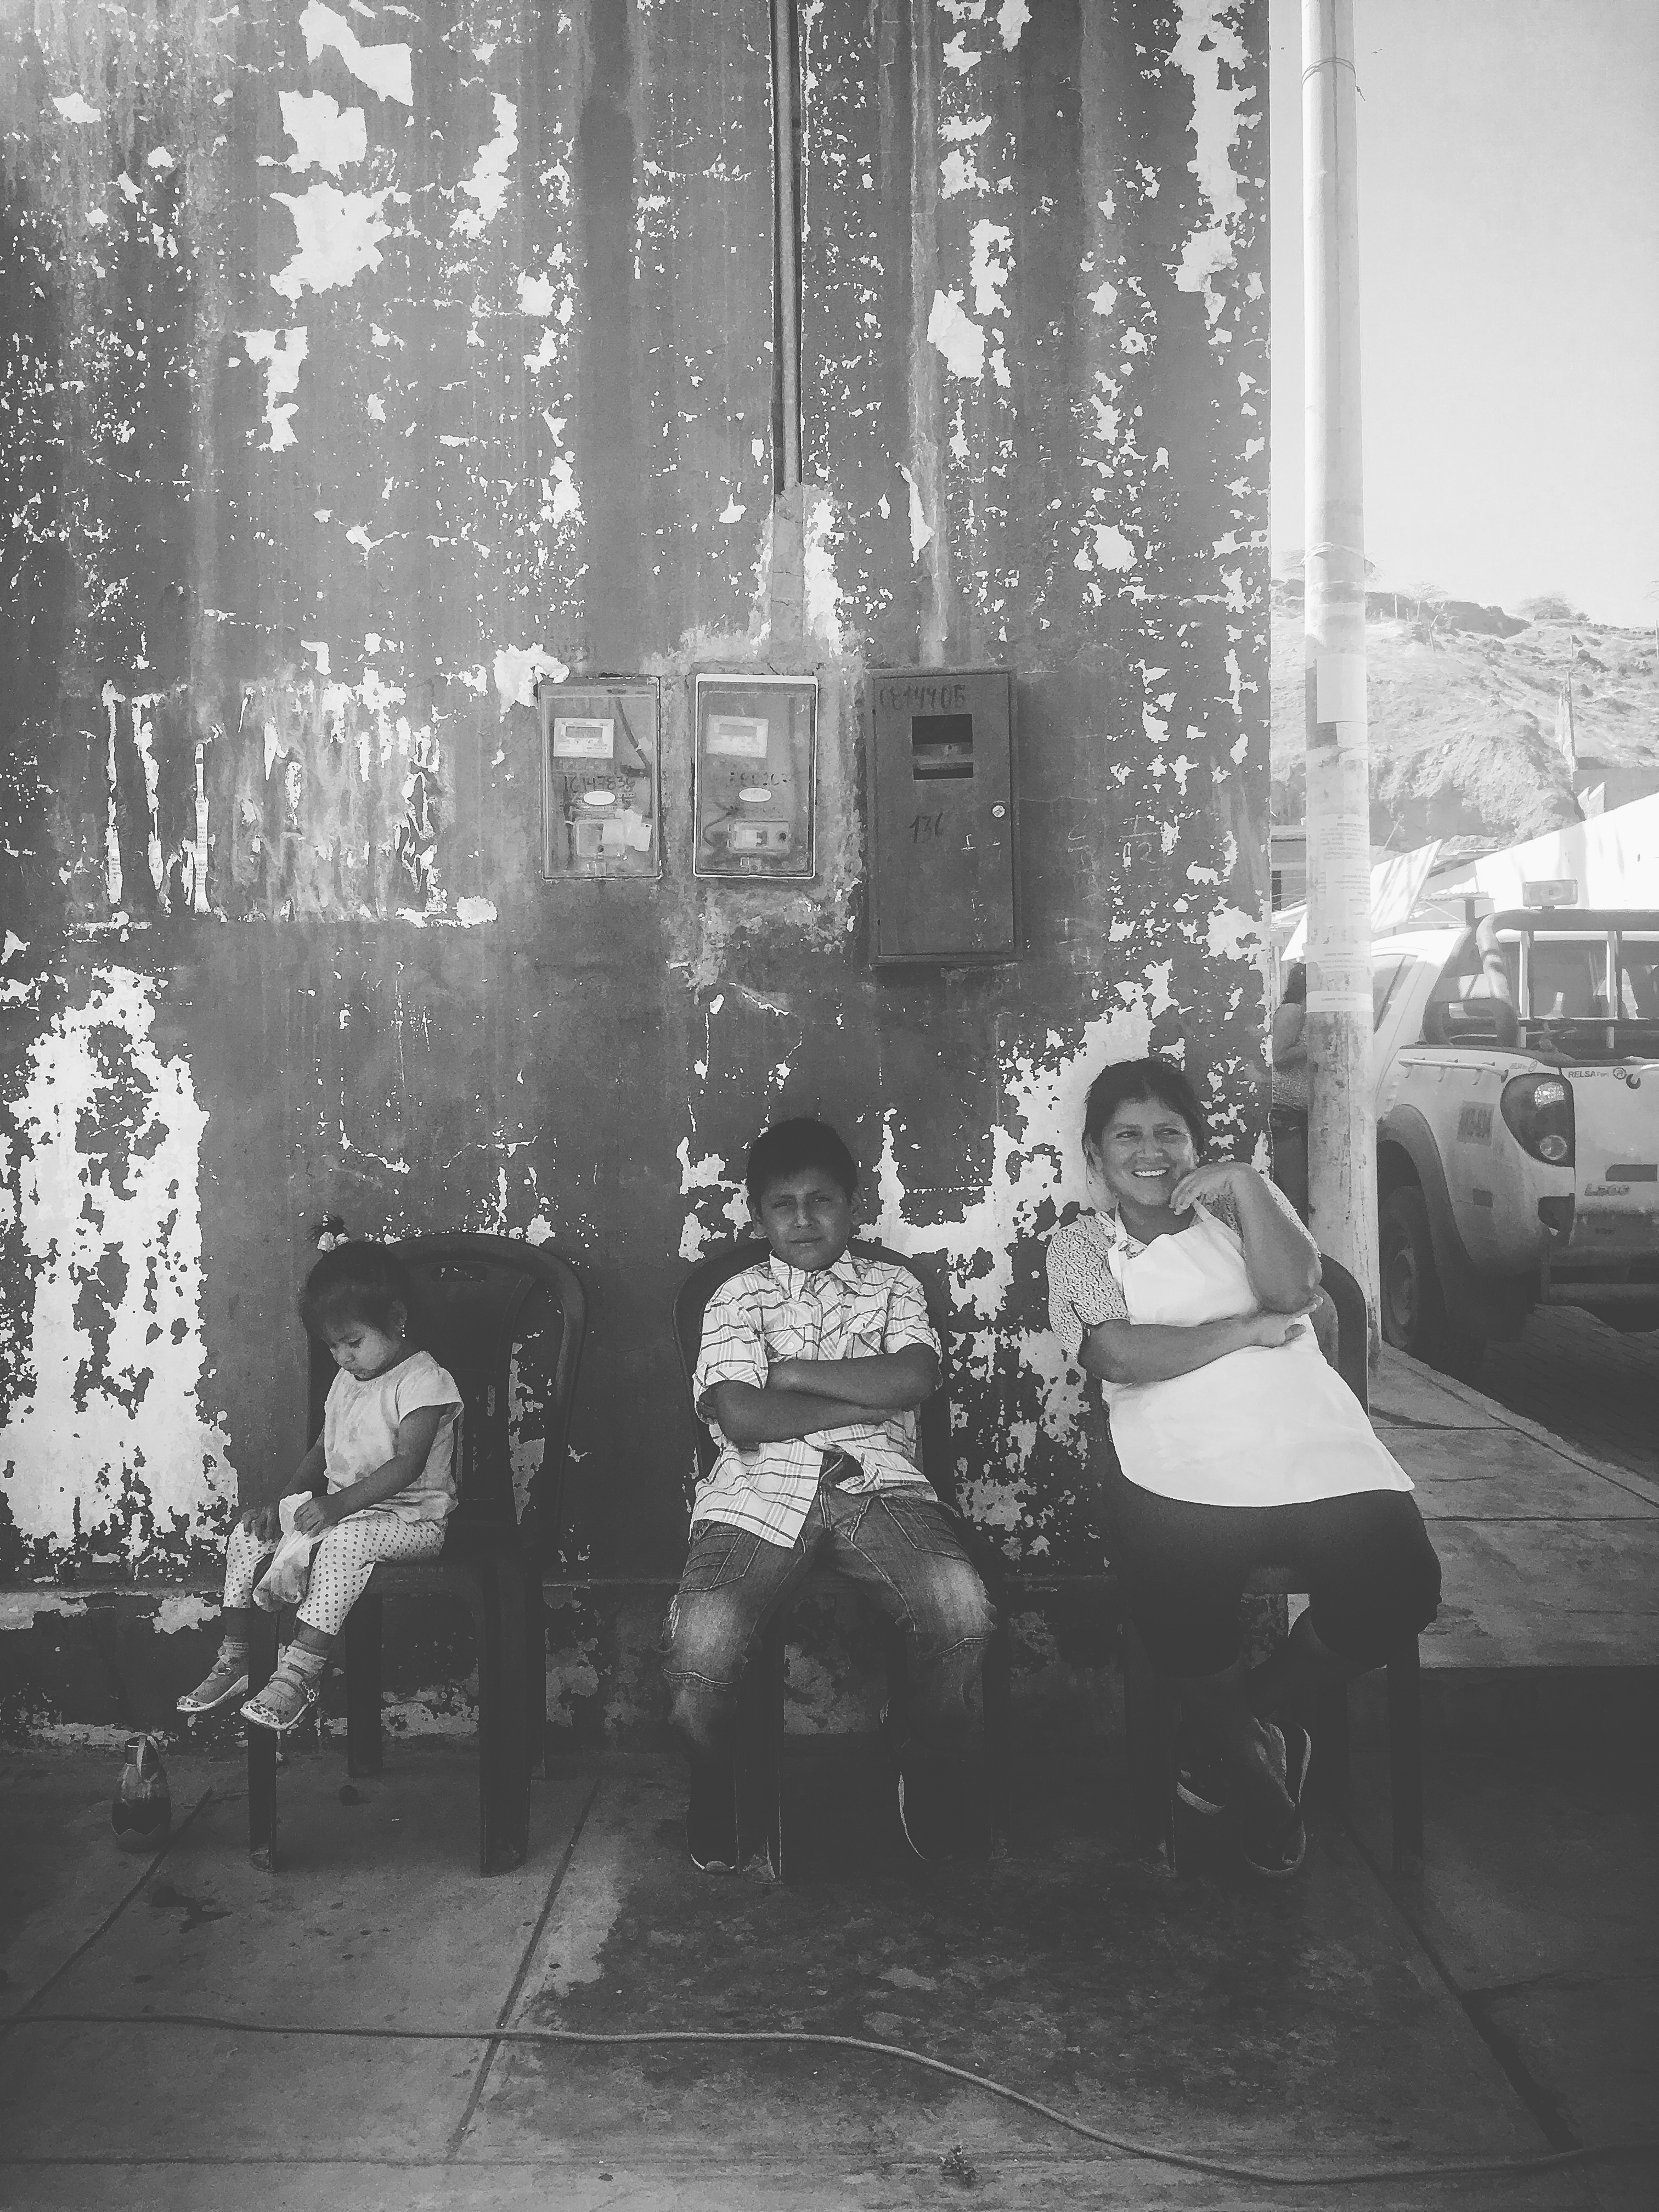 Streets of Mancorá